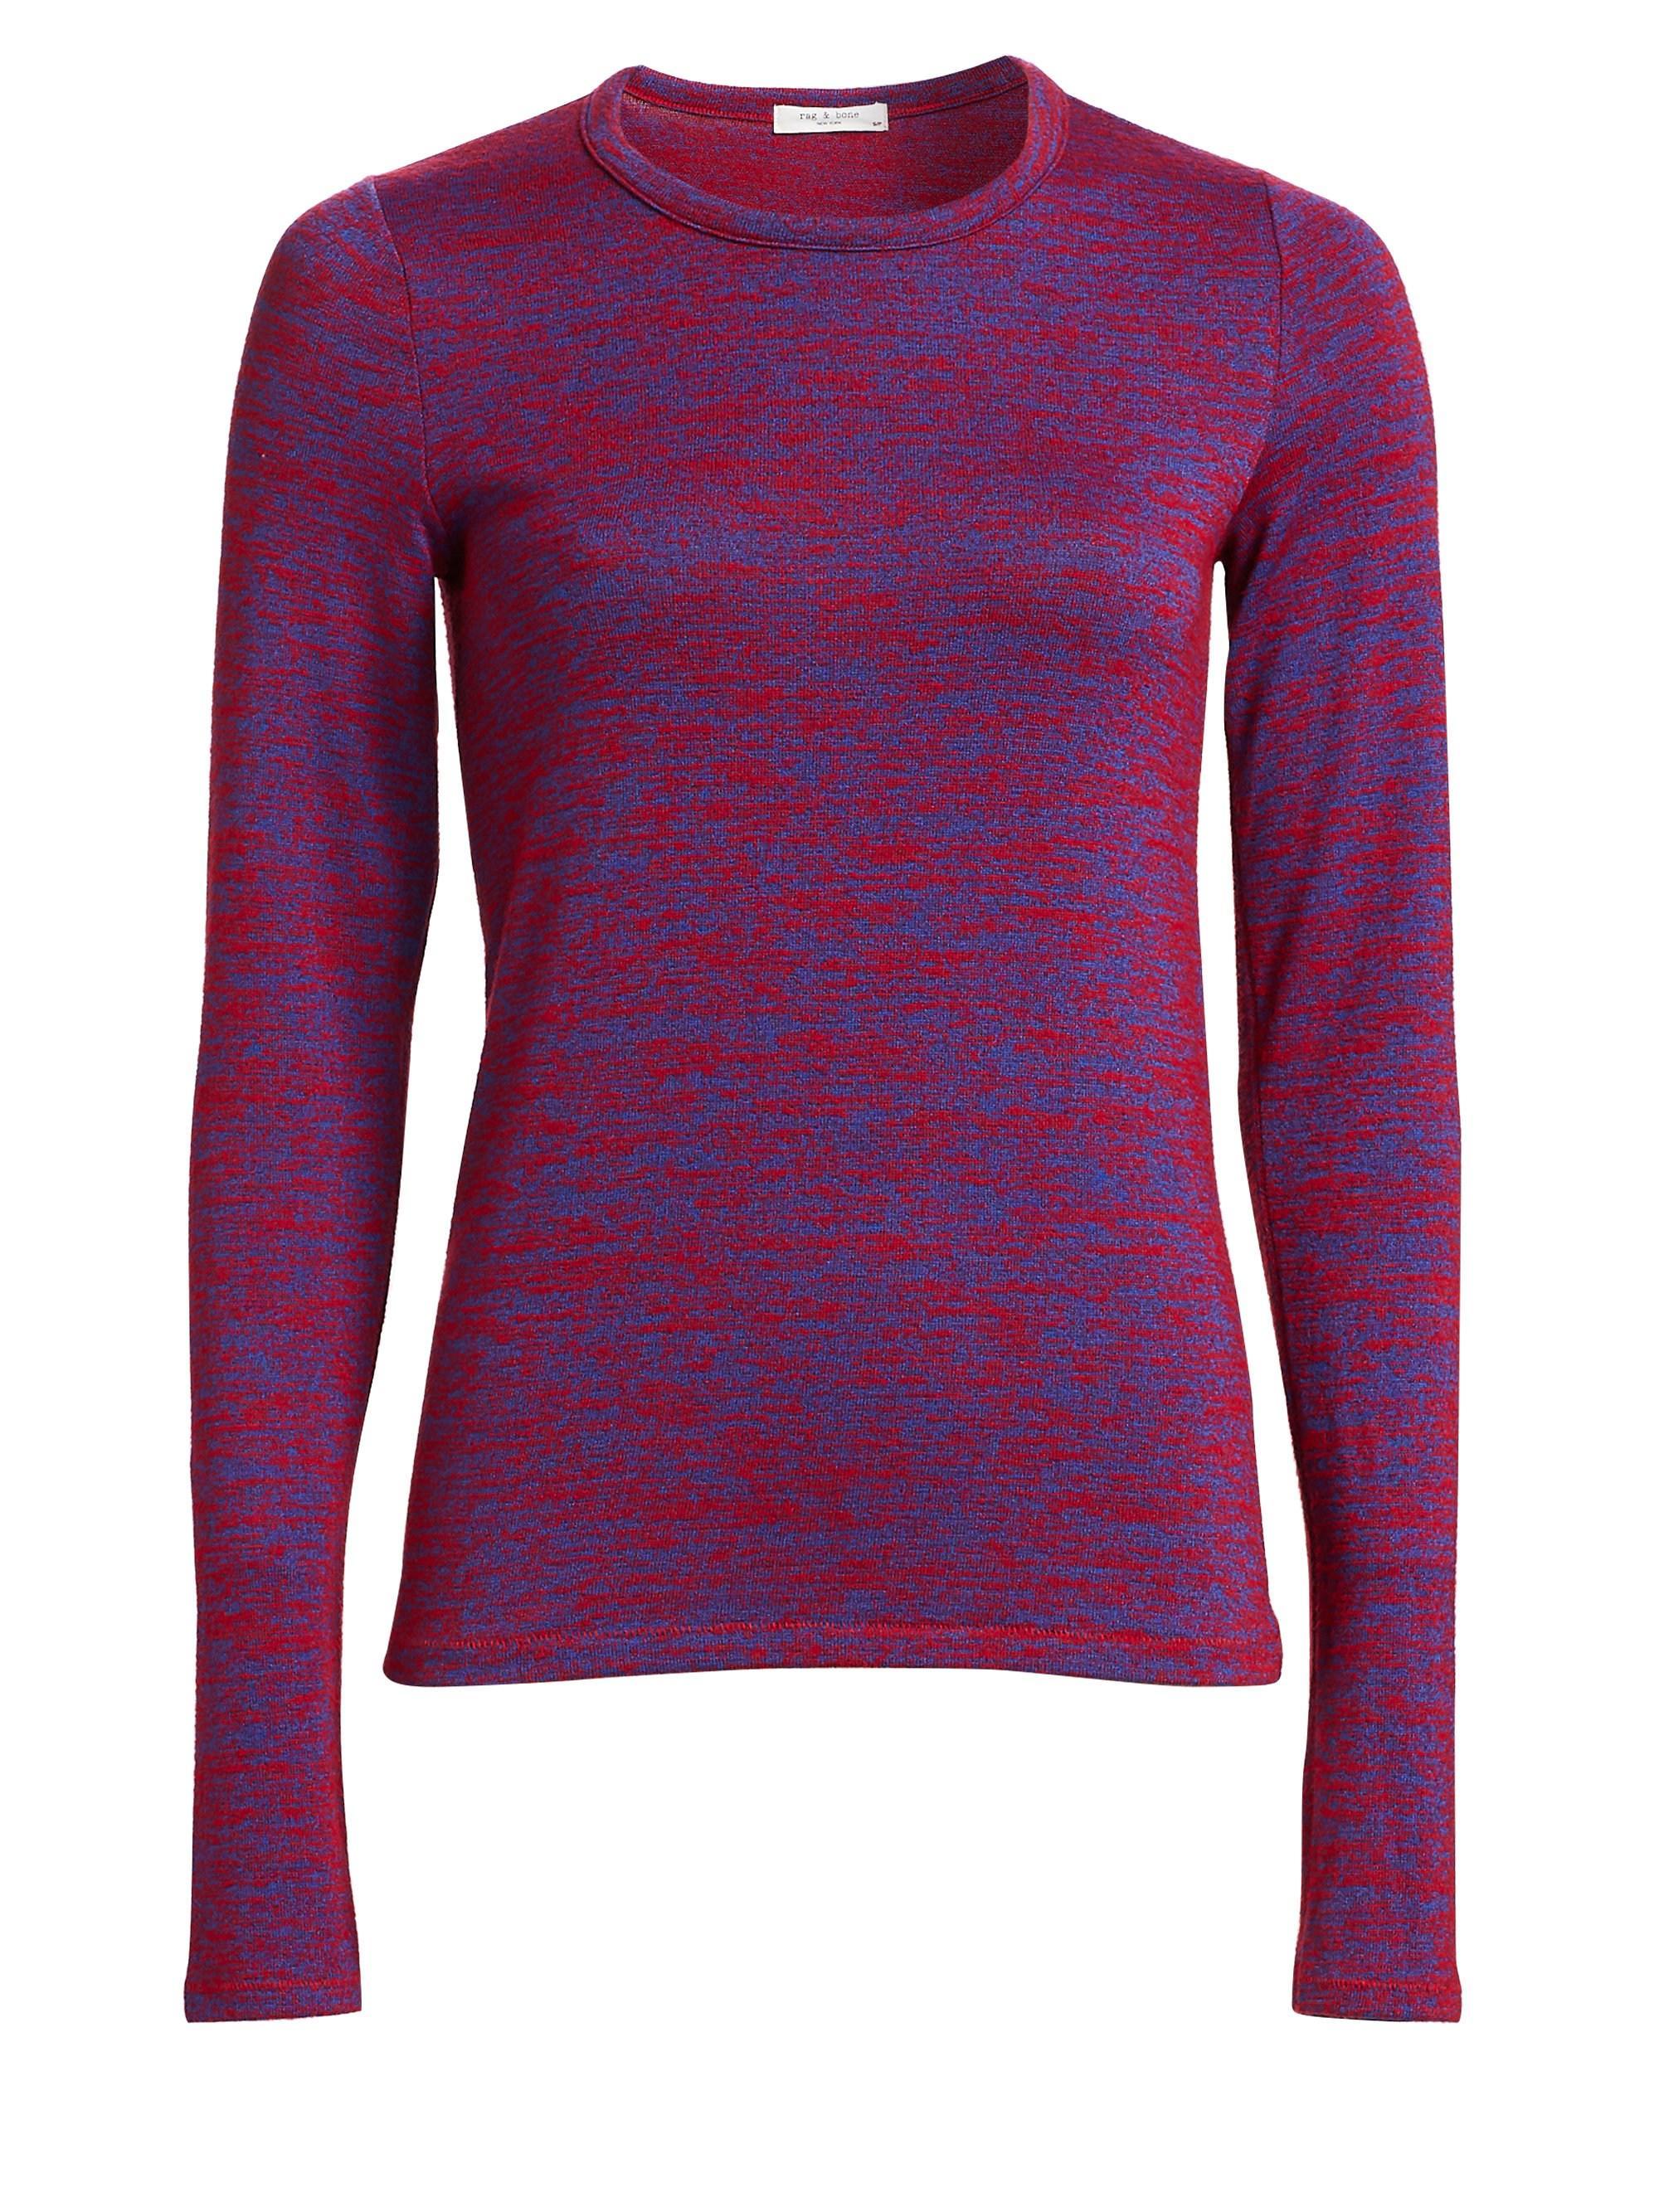 59b9b269e5 Lyst - Rag & Bone Marled Jersey Long-sleeve Tee in Purple